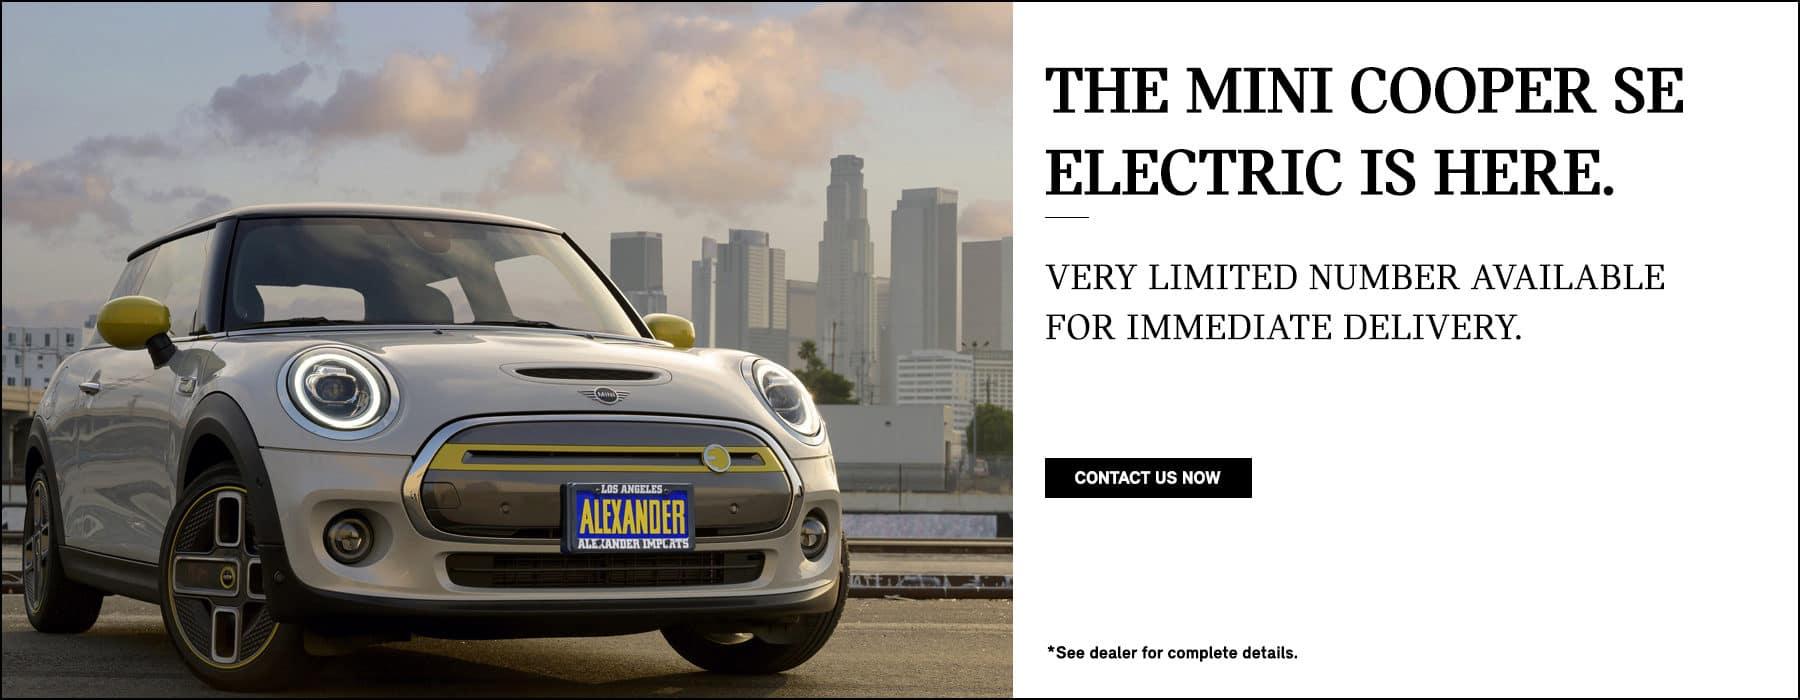 MINI Electric in stock now at Nick Alexander MINI